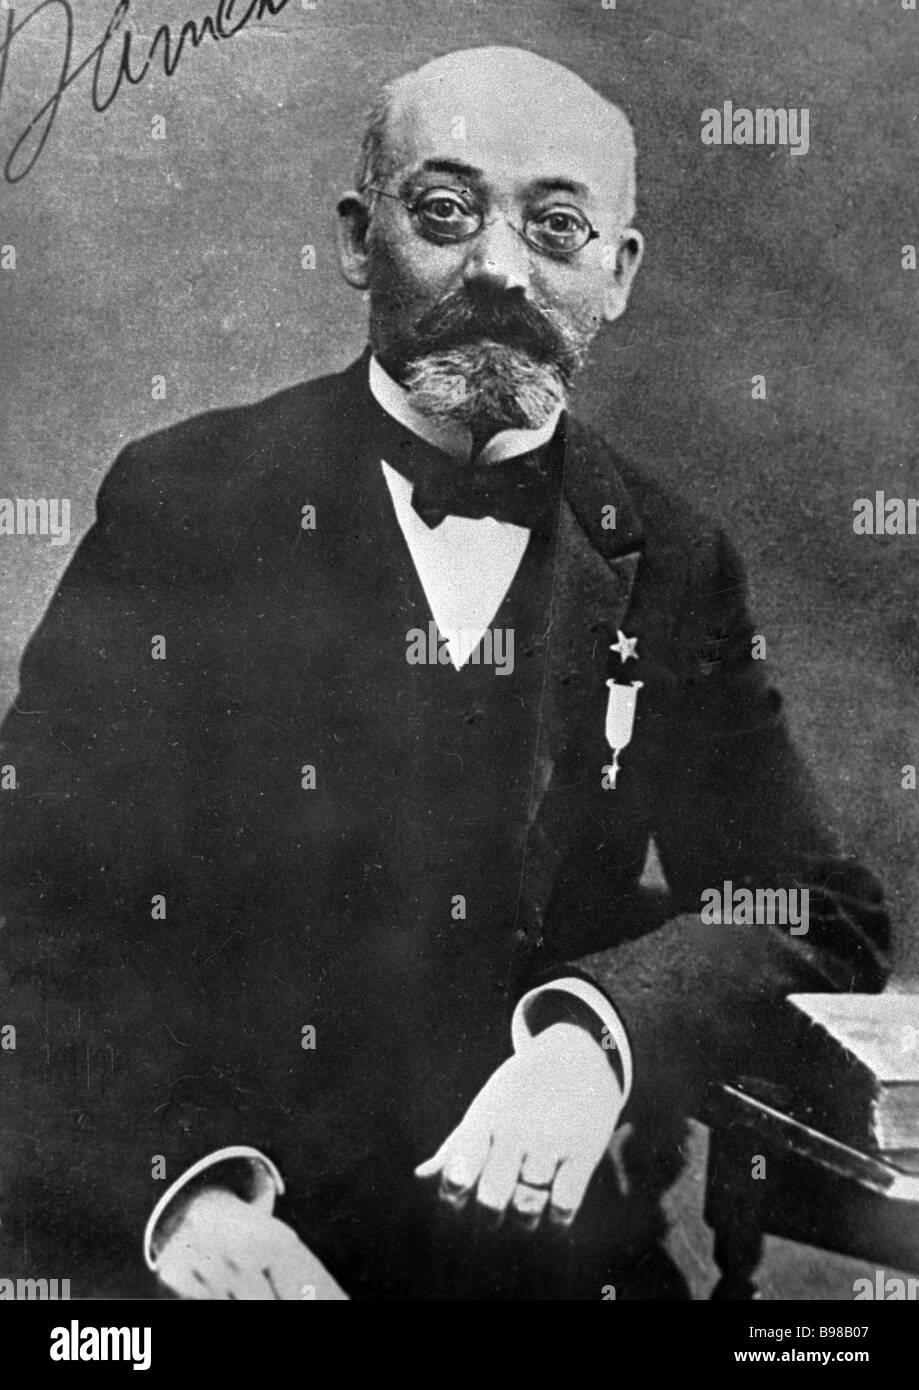 Esperanto founder Ludwik Zamenhof 1859 1917 - Stock Image